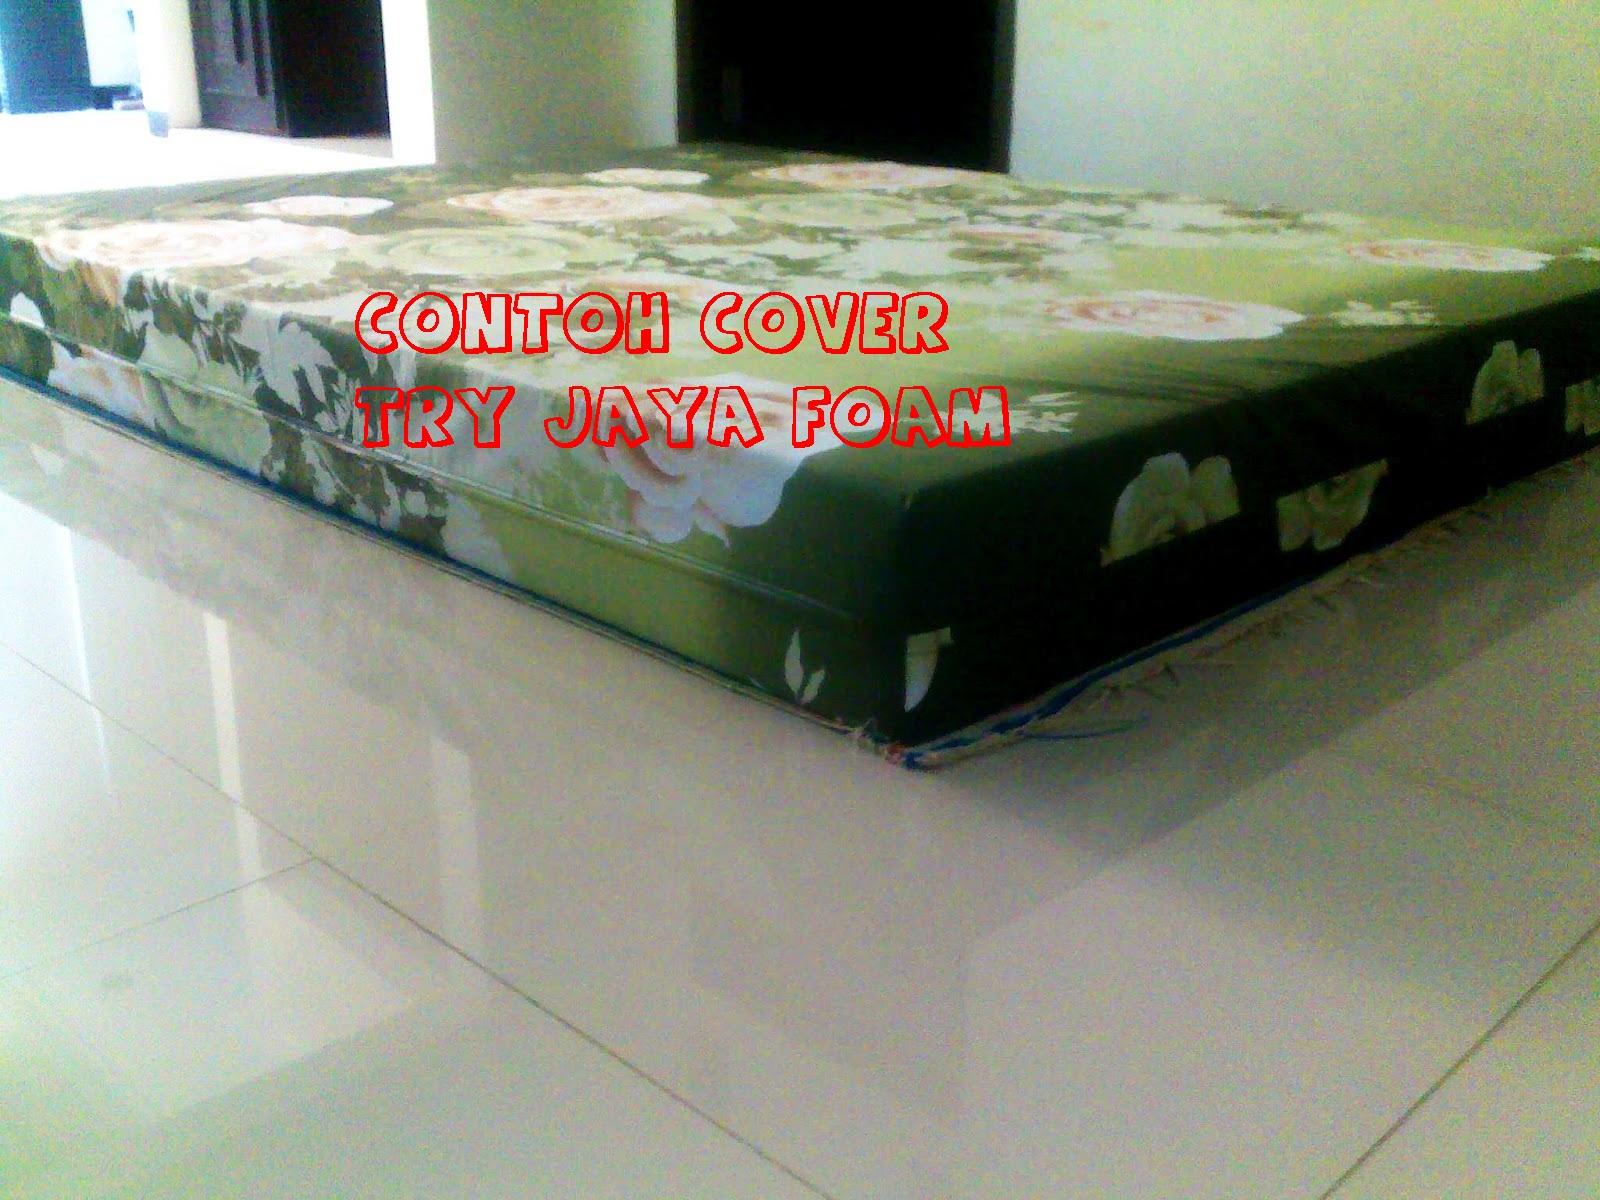 sofa bed kasur busa lipat inoac jakarta spanish brand jual kwalitas super try jaya foam toko